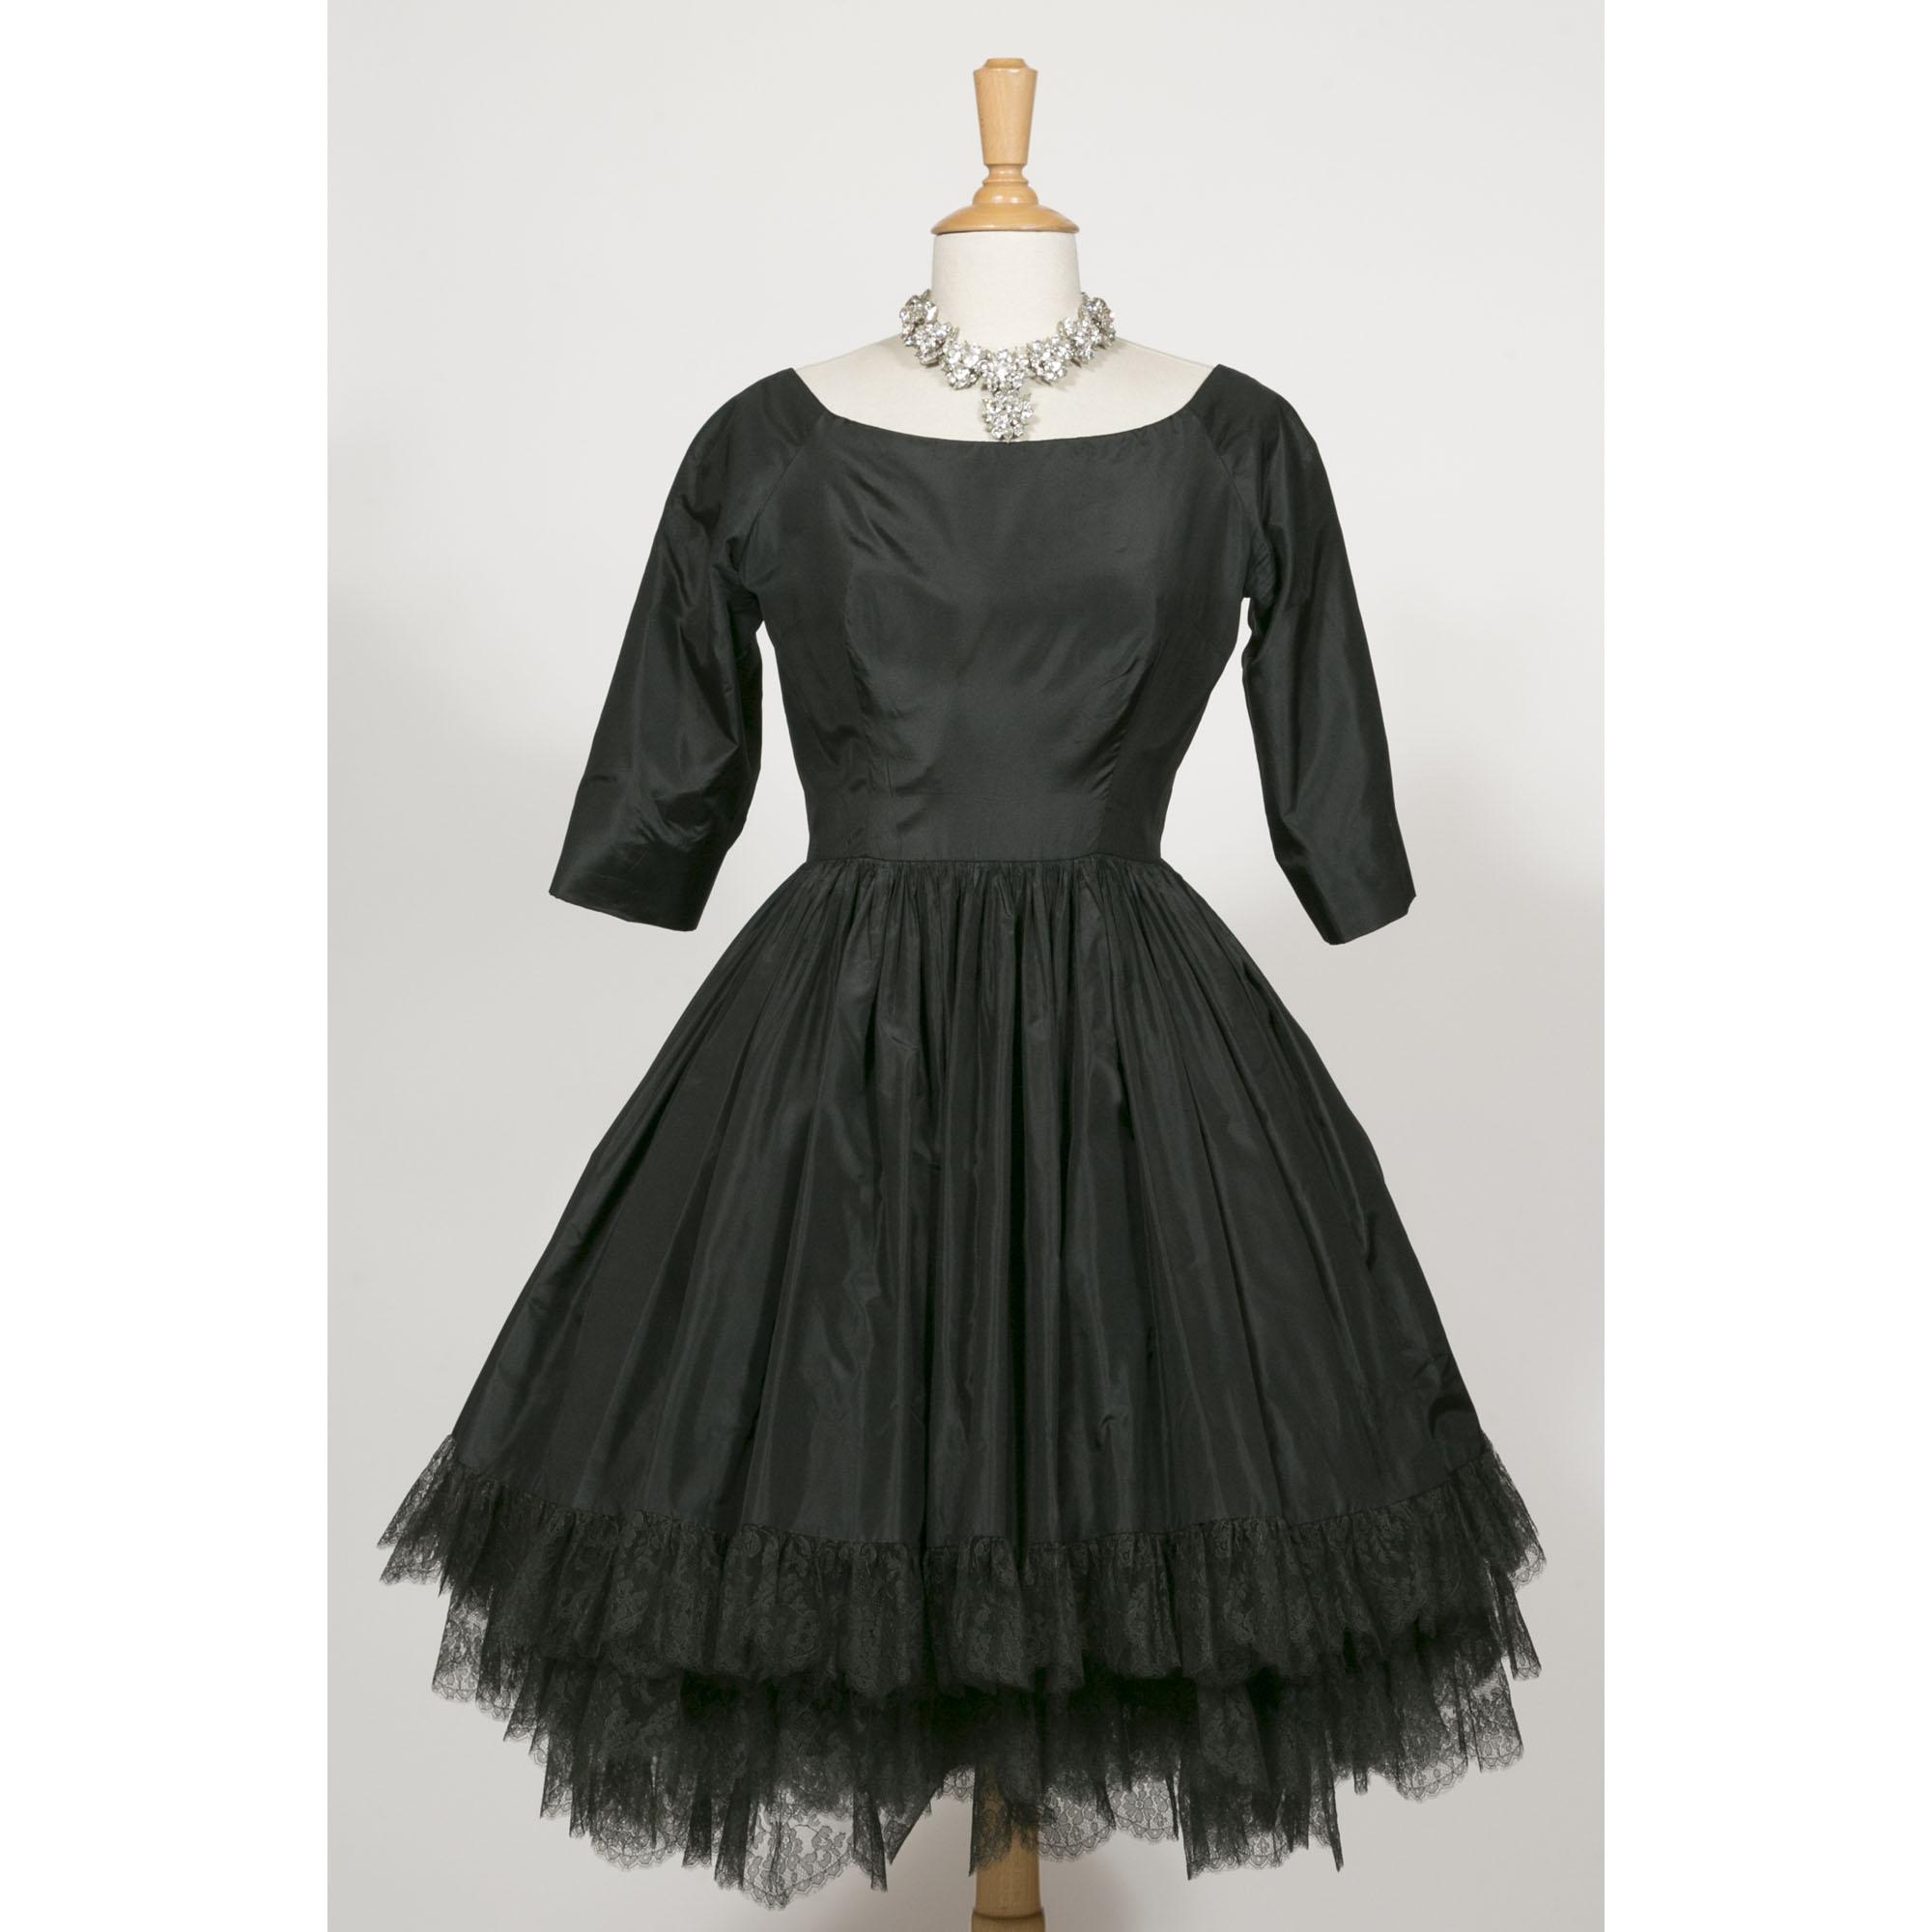 christian dior haute couture robe folies amoureuses vintage fashion paris. Black Bedroom Furniture Sets. Home Design Ideas